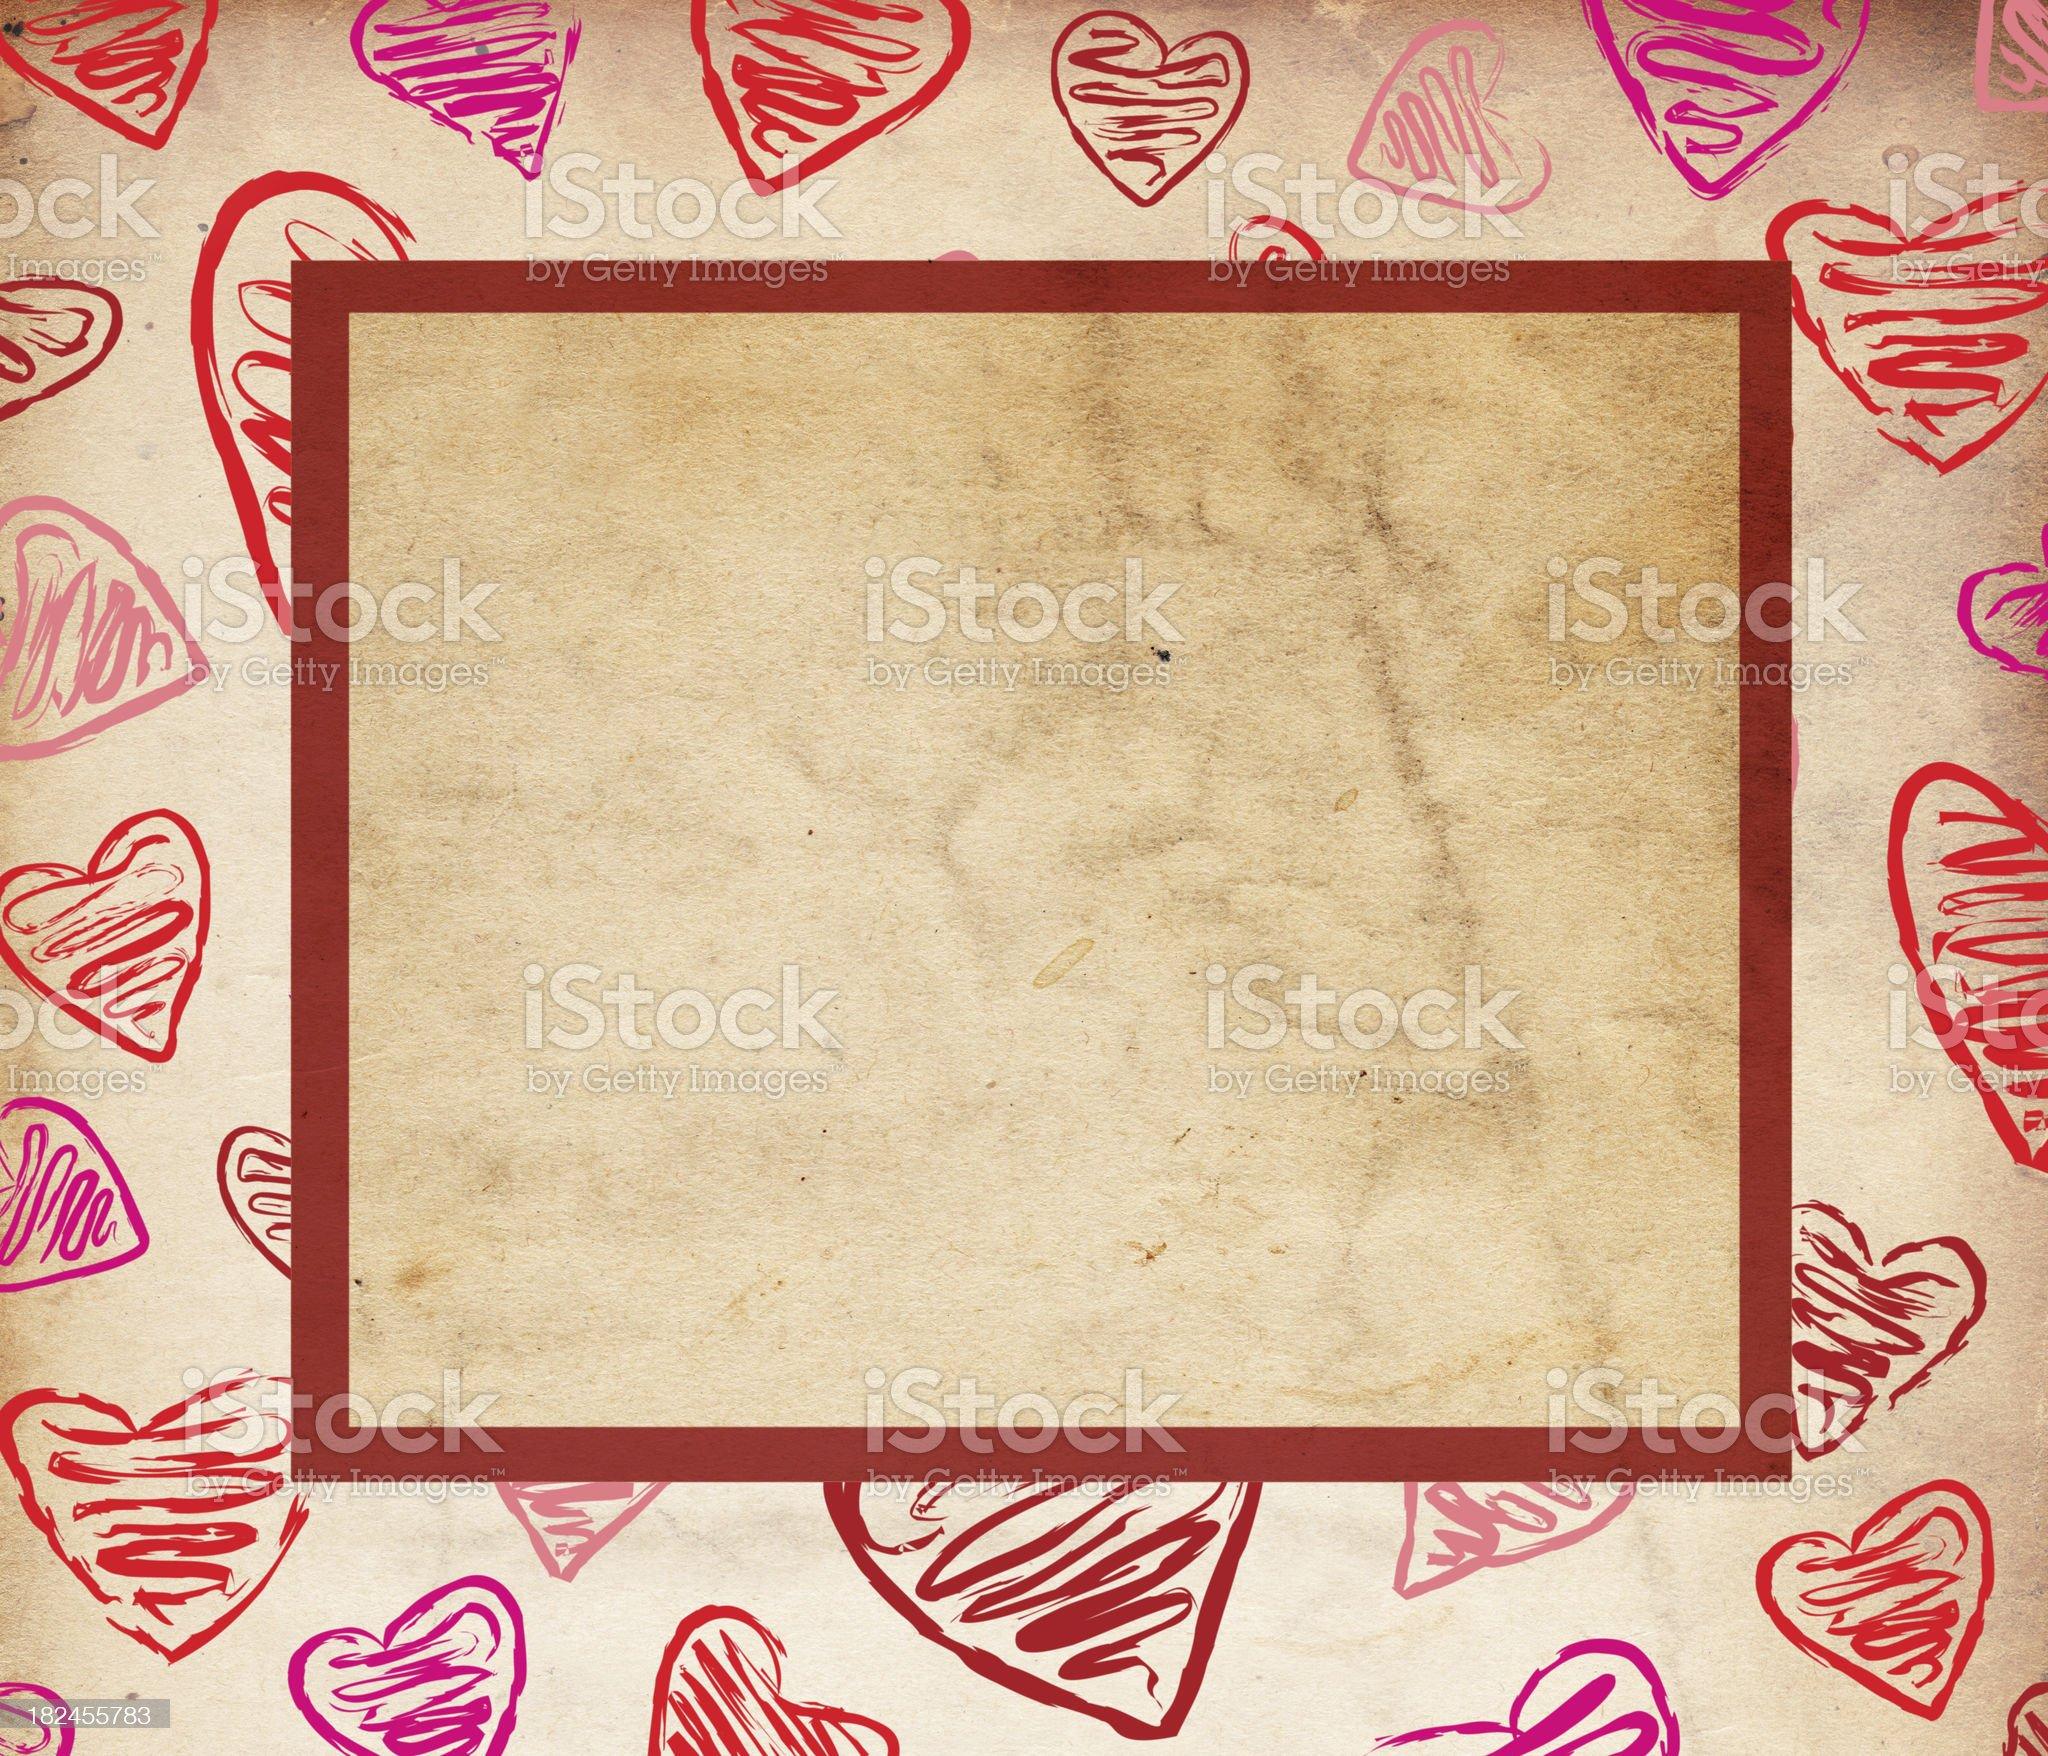 Valentine Paper Grunge - XXXL royalty-free stock photo